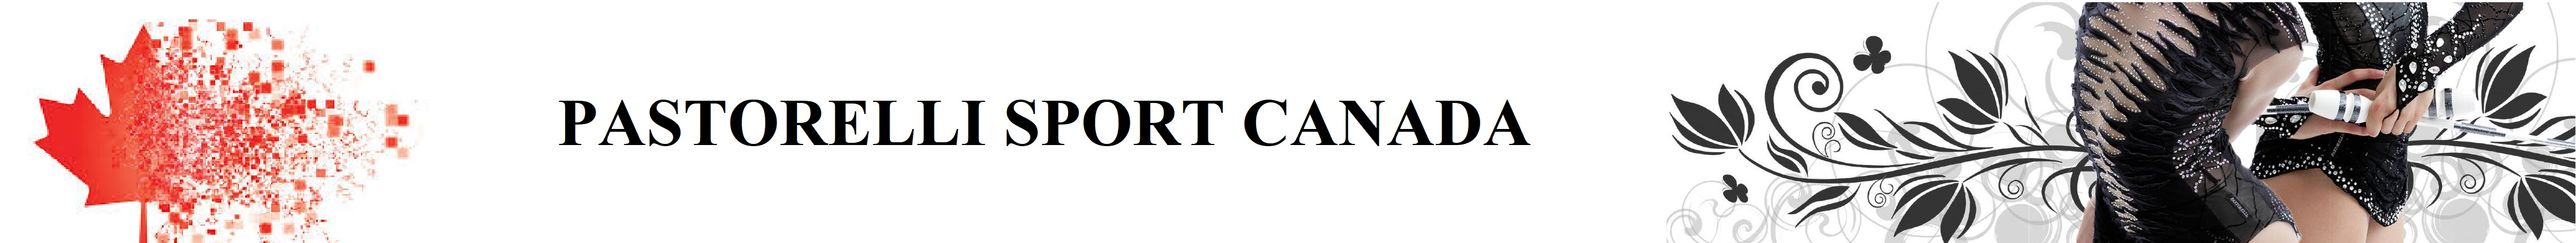 PASTORELLI SPORT CANADA